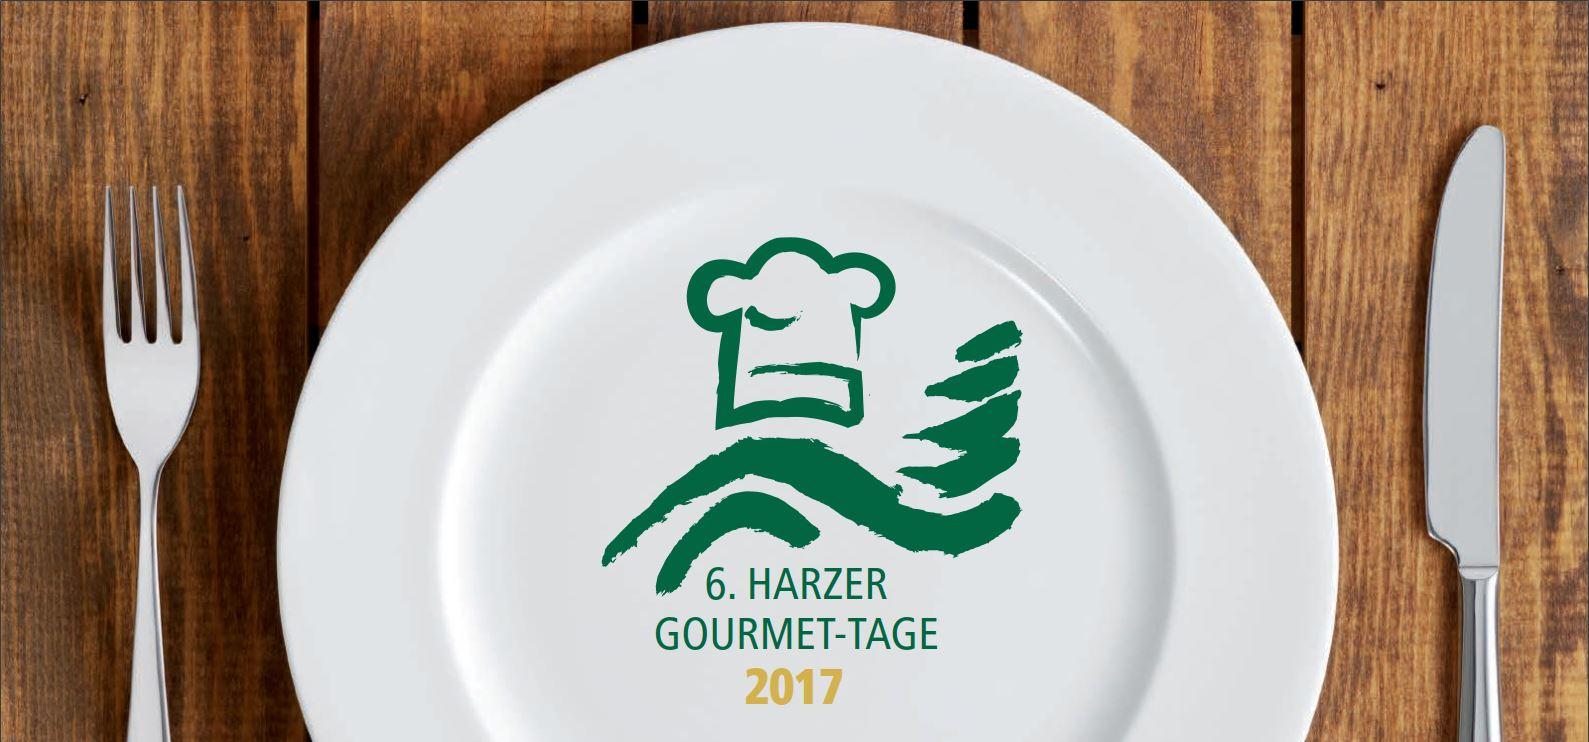 Harzer Gourmet-Tage 2017